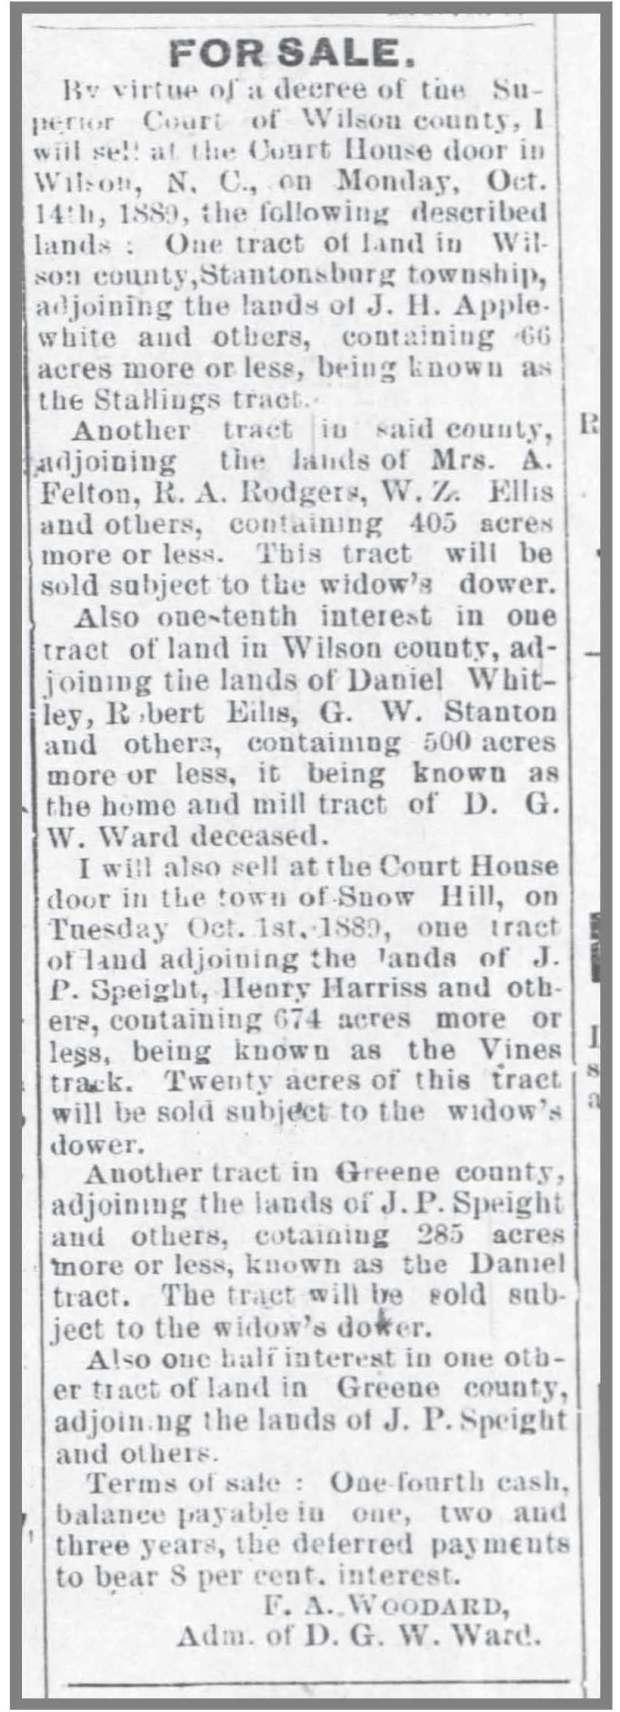 wilson_advance__8_22_1889_dgw_ward_estate_land_sale